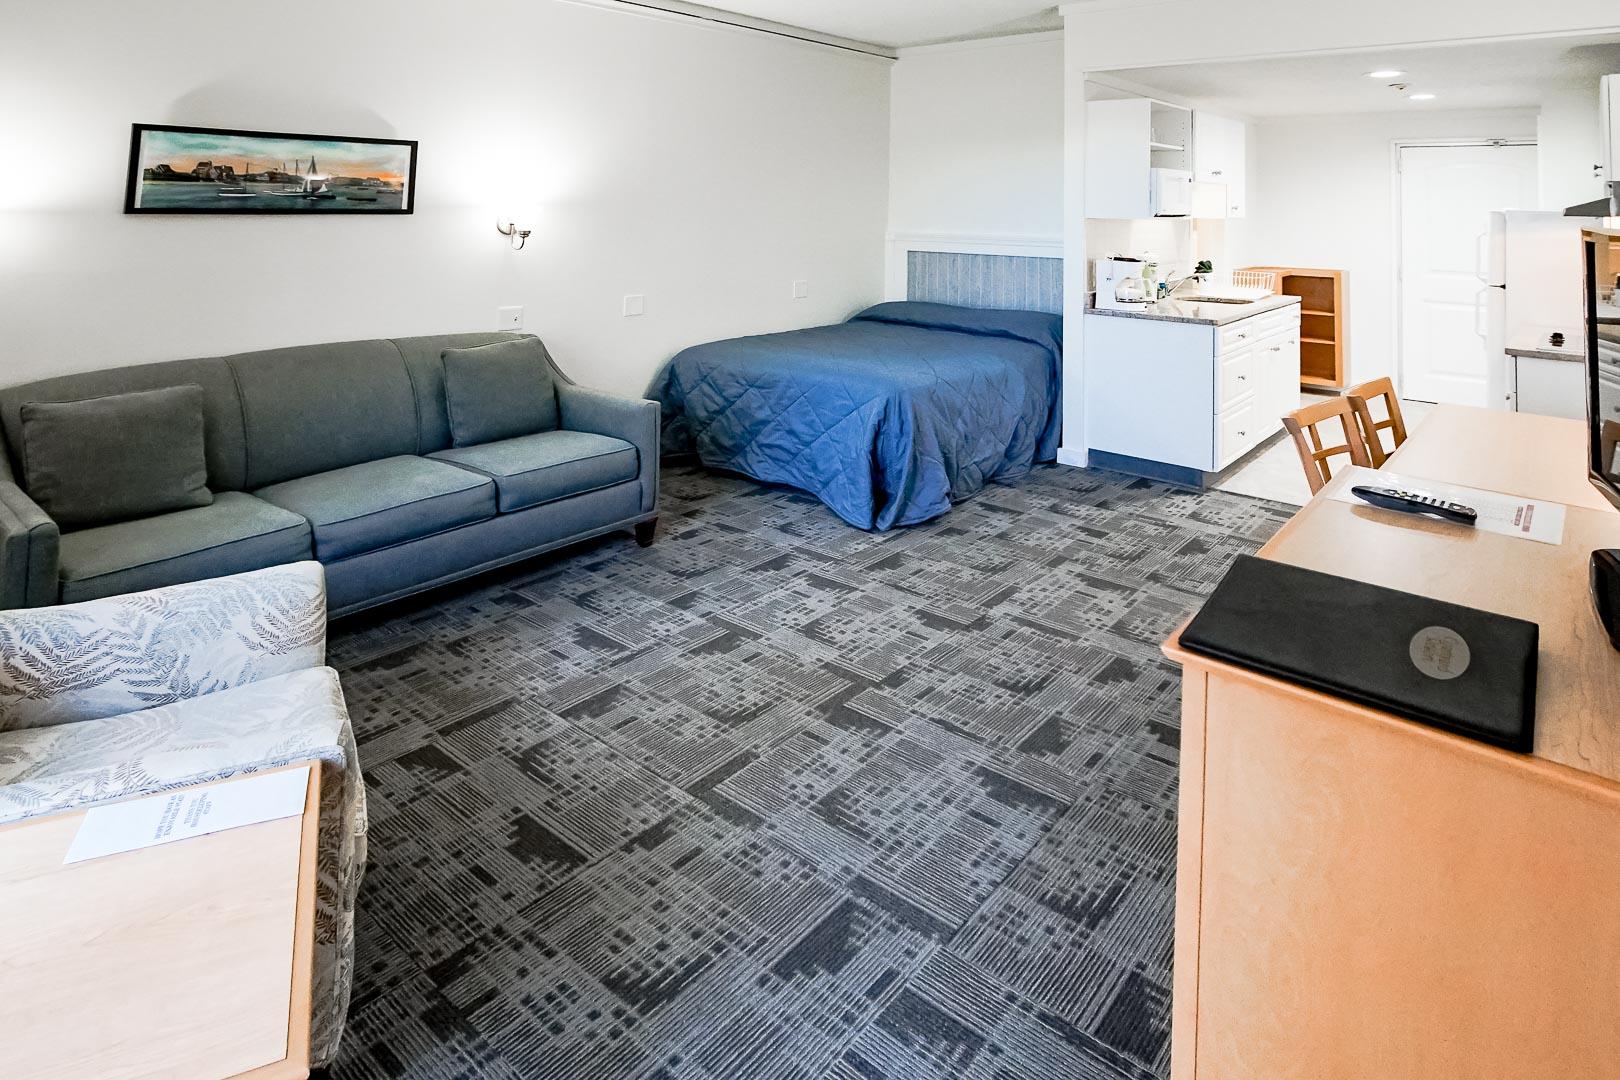 A cozy studio unit at VRI's Courtyard Resort in Massachusetts.